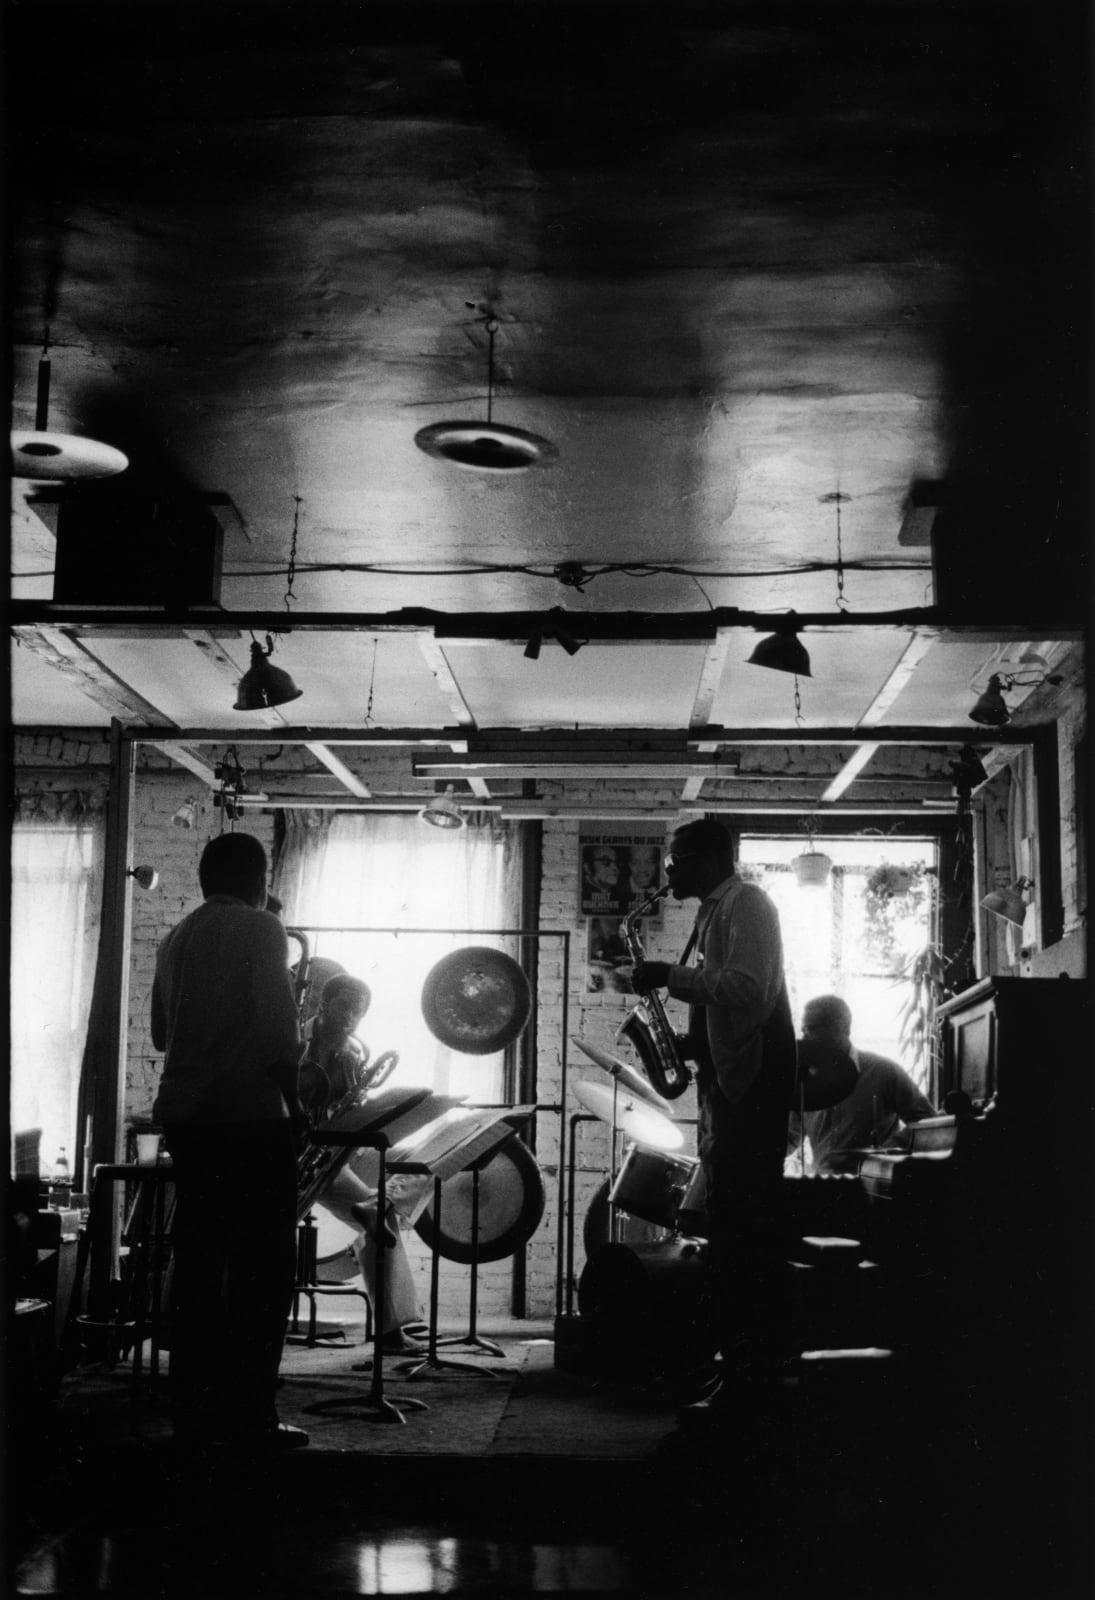 Ming Smith, Loft Jazz with Max Roach, 1981